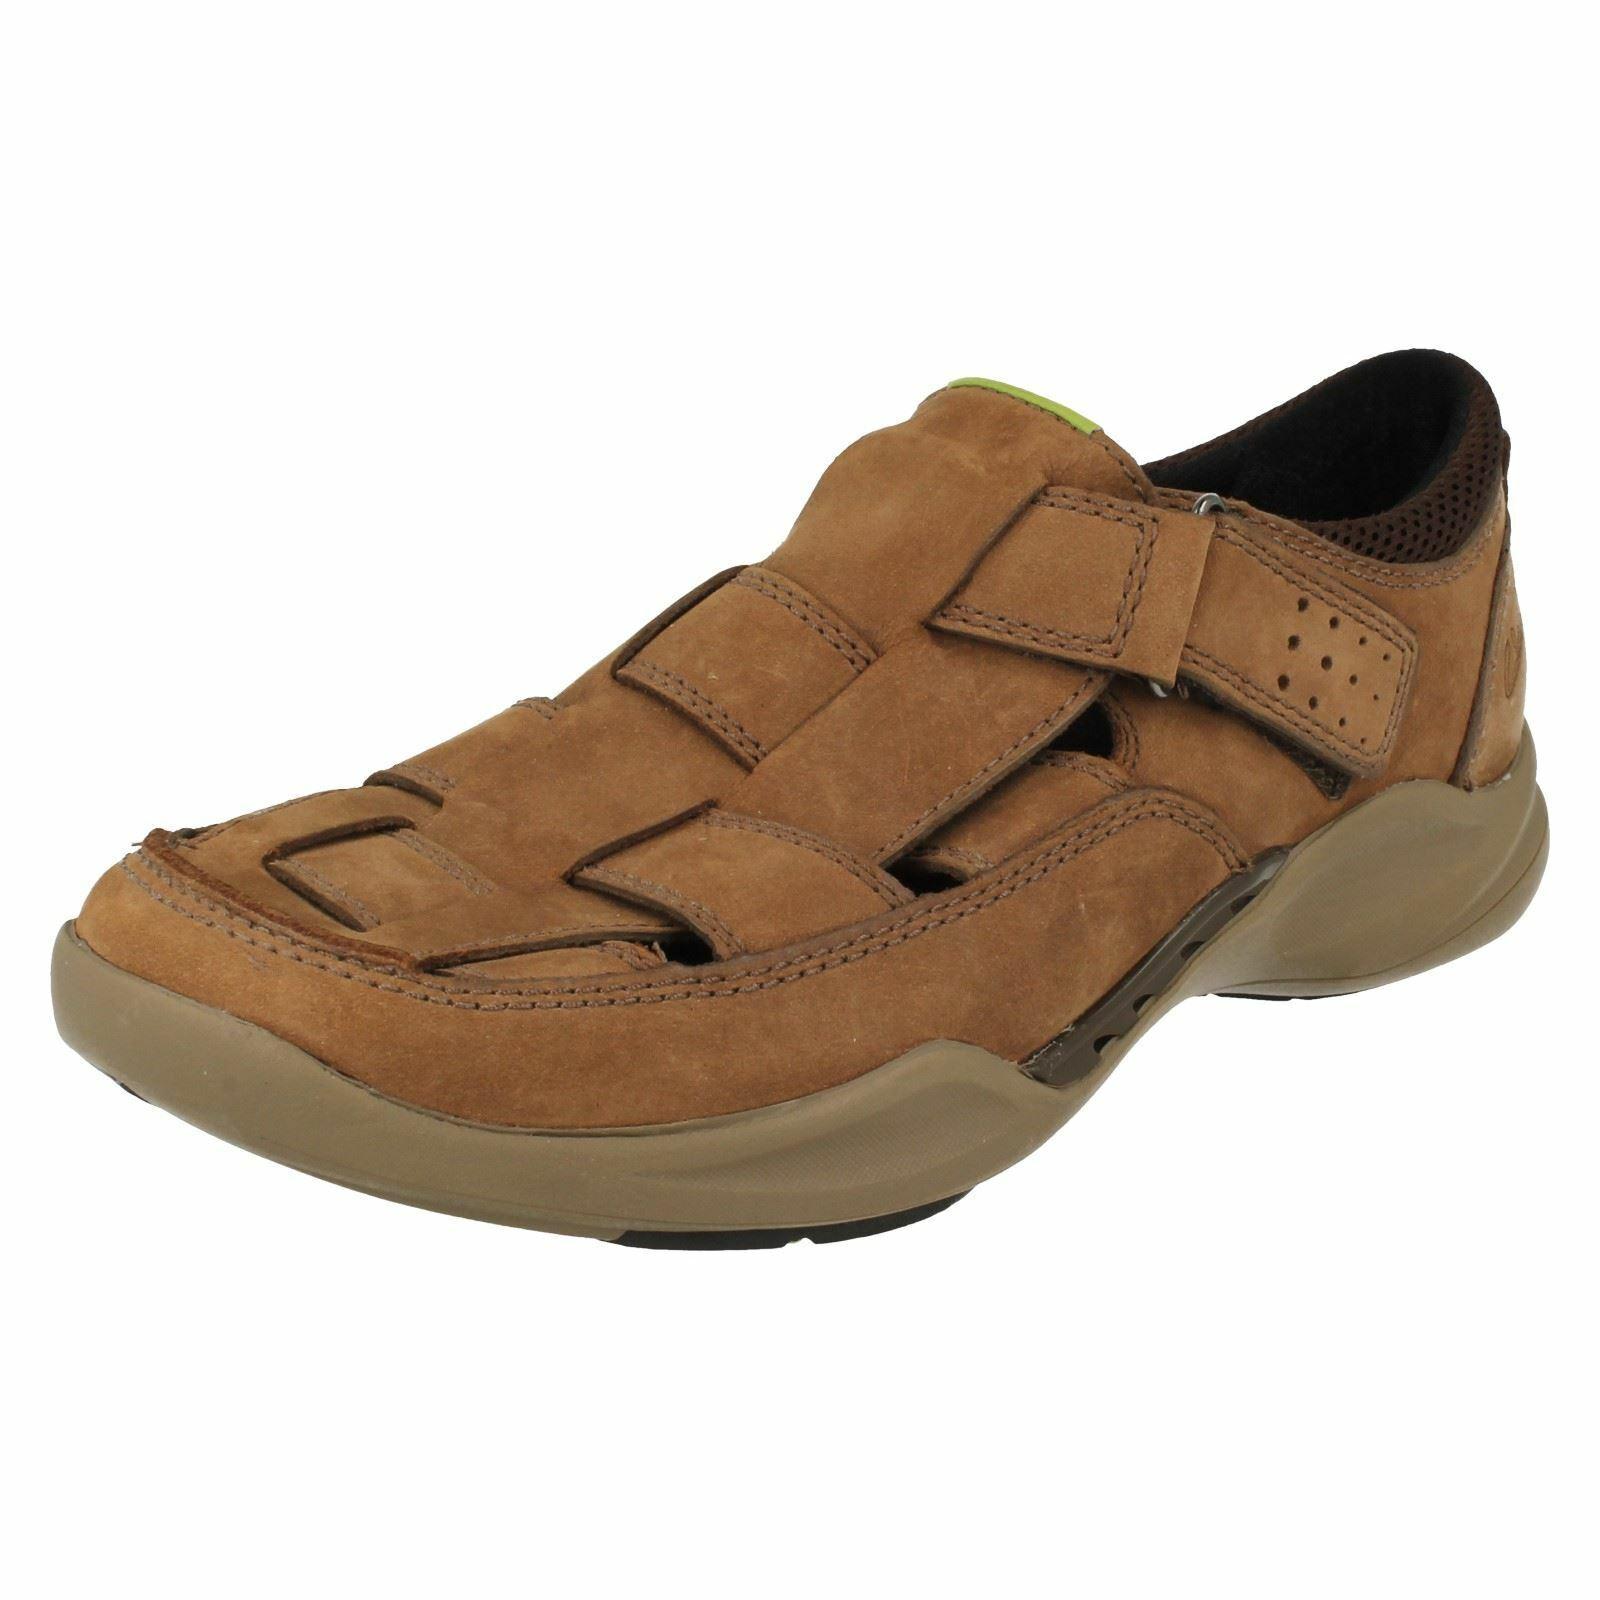 Mens Clarks Wave Walk Closed Toe Sandals - Wave Breeze